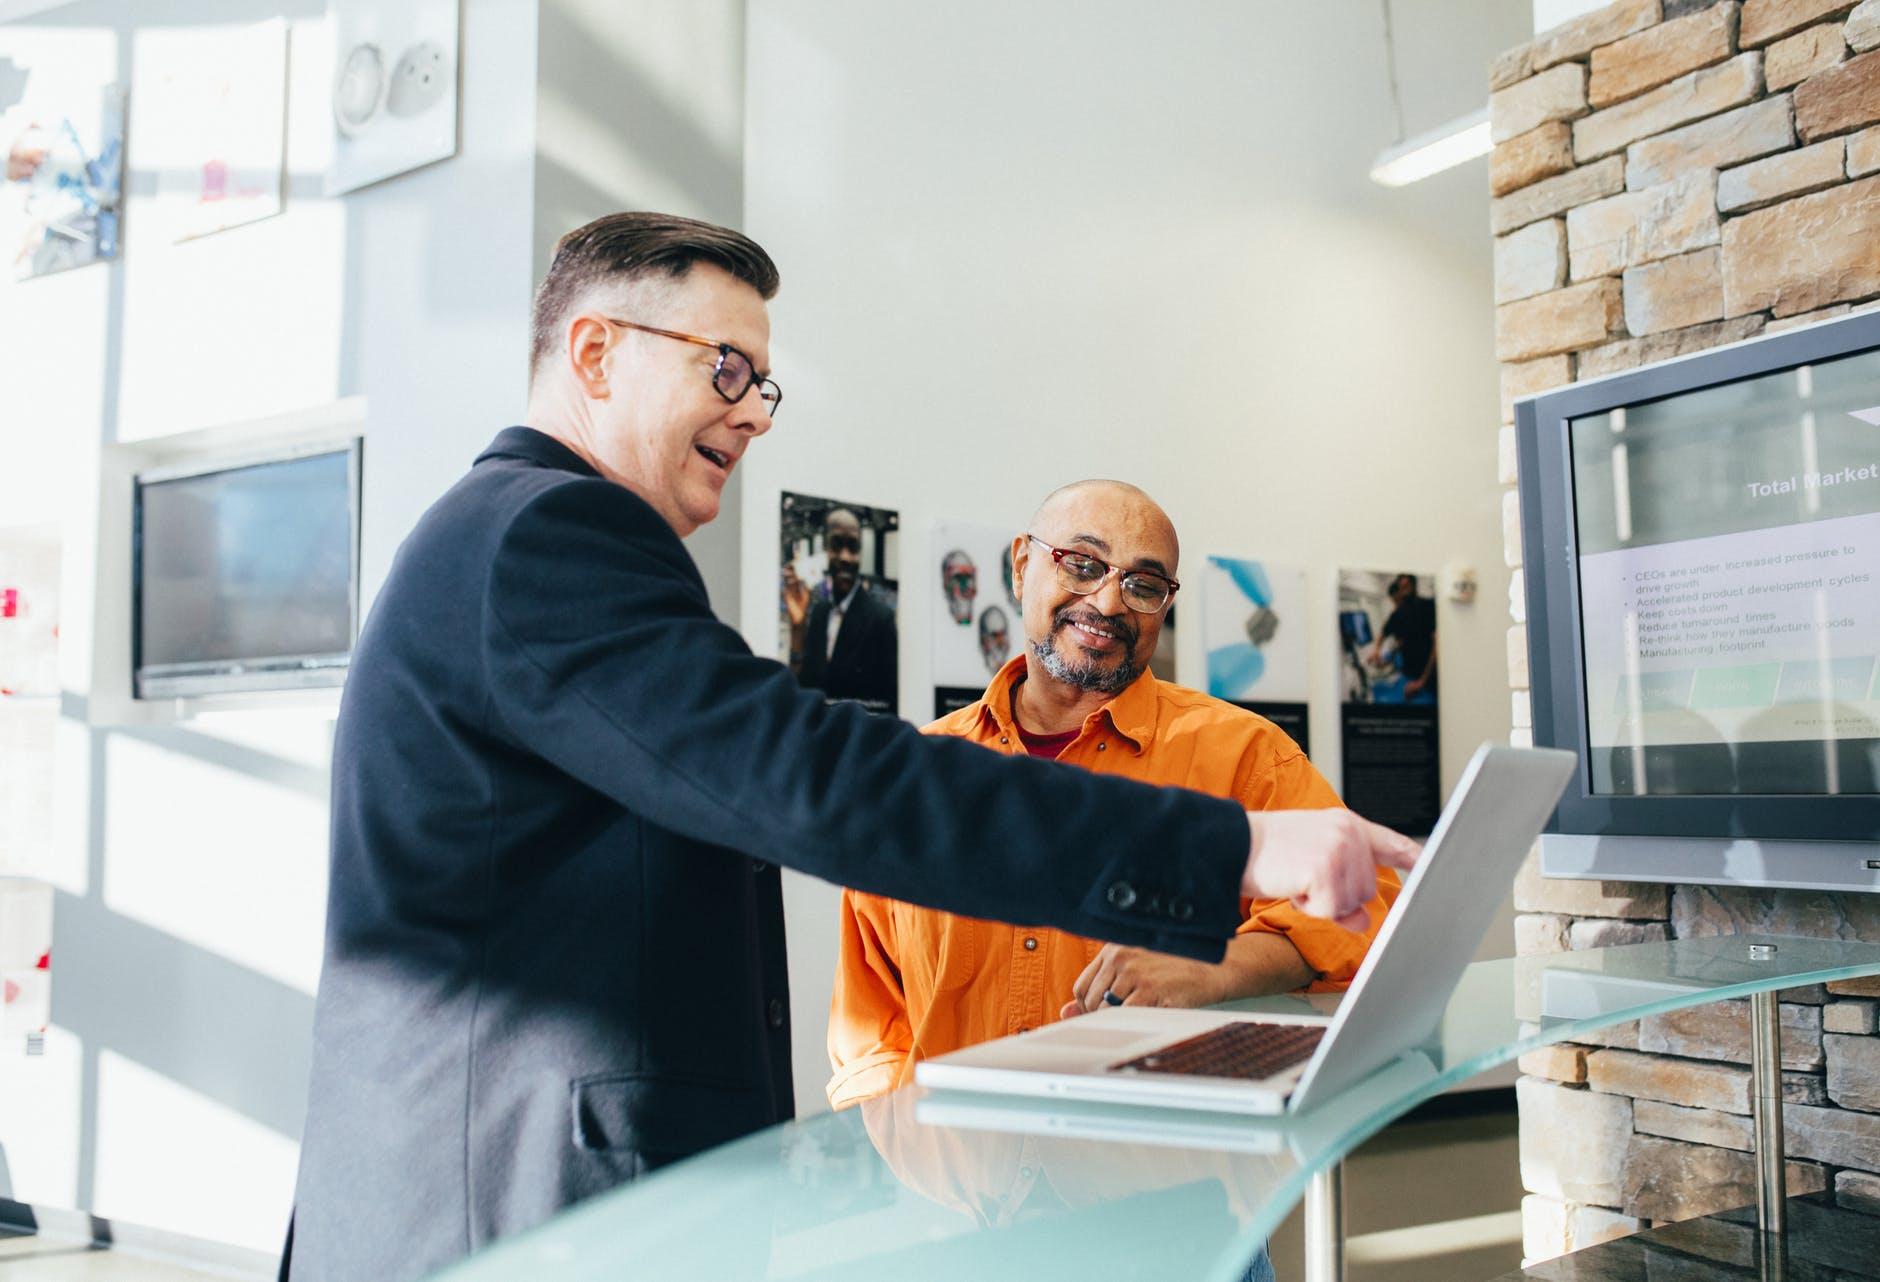 Seven key business skills make you a super salesman